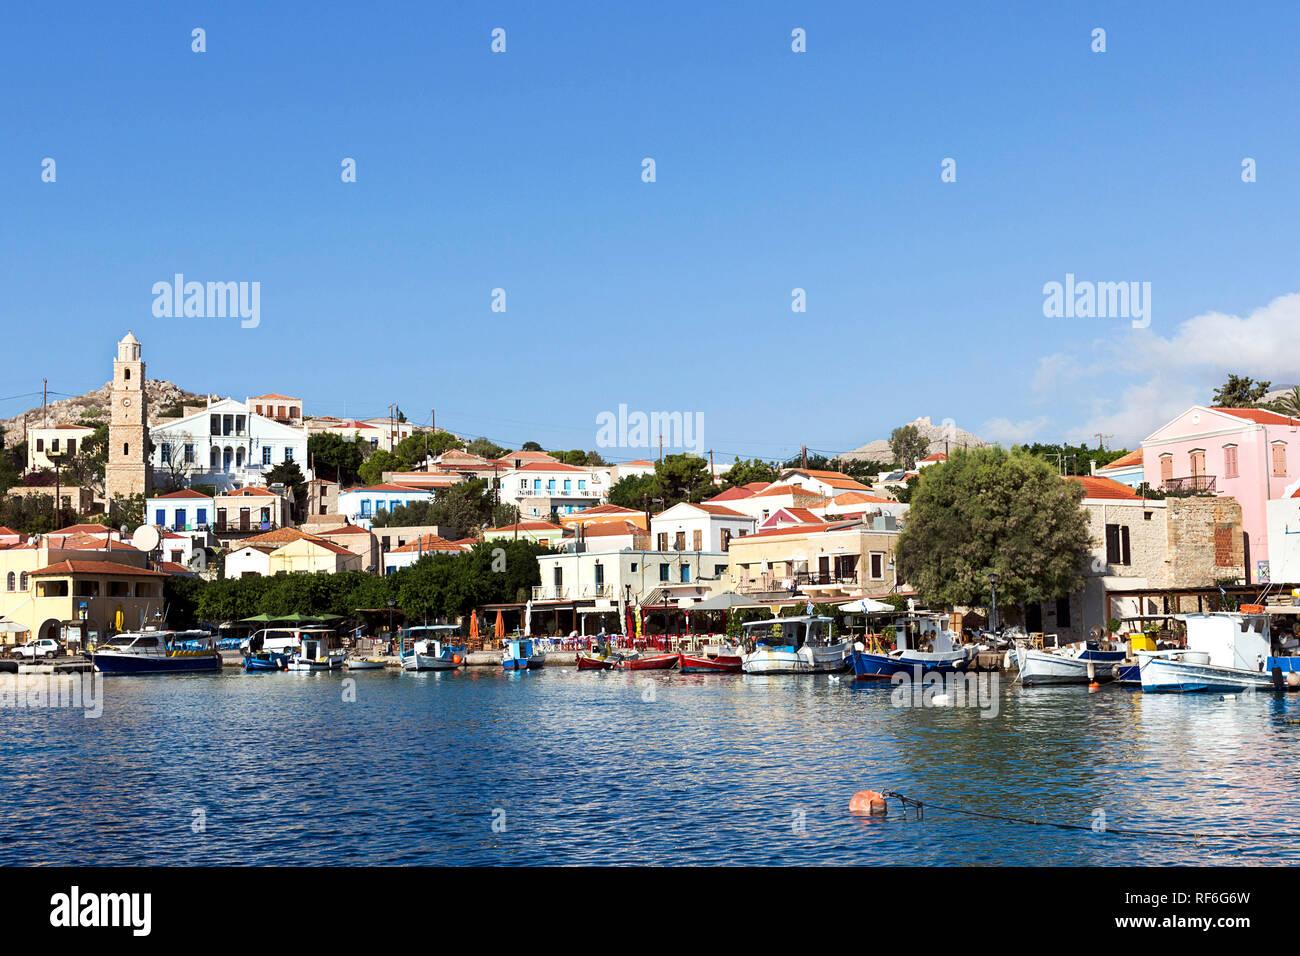 Halki, Chalki - View of Emporio village on Aegean sea. Dodecanese Islands, Greece - Stock Image